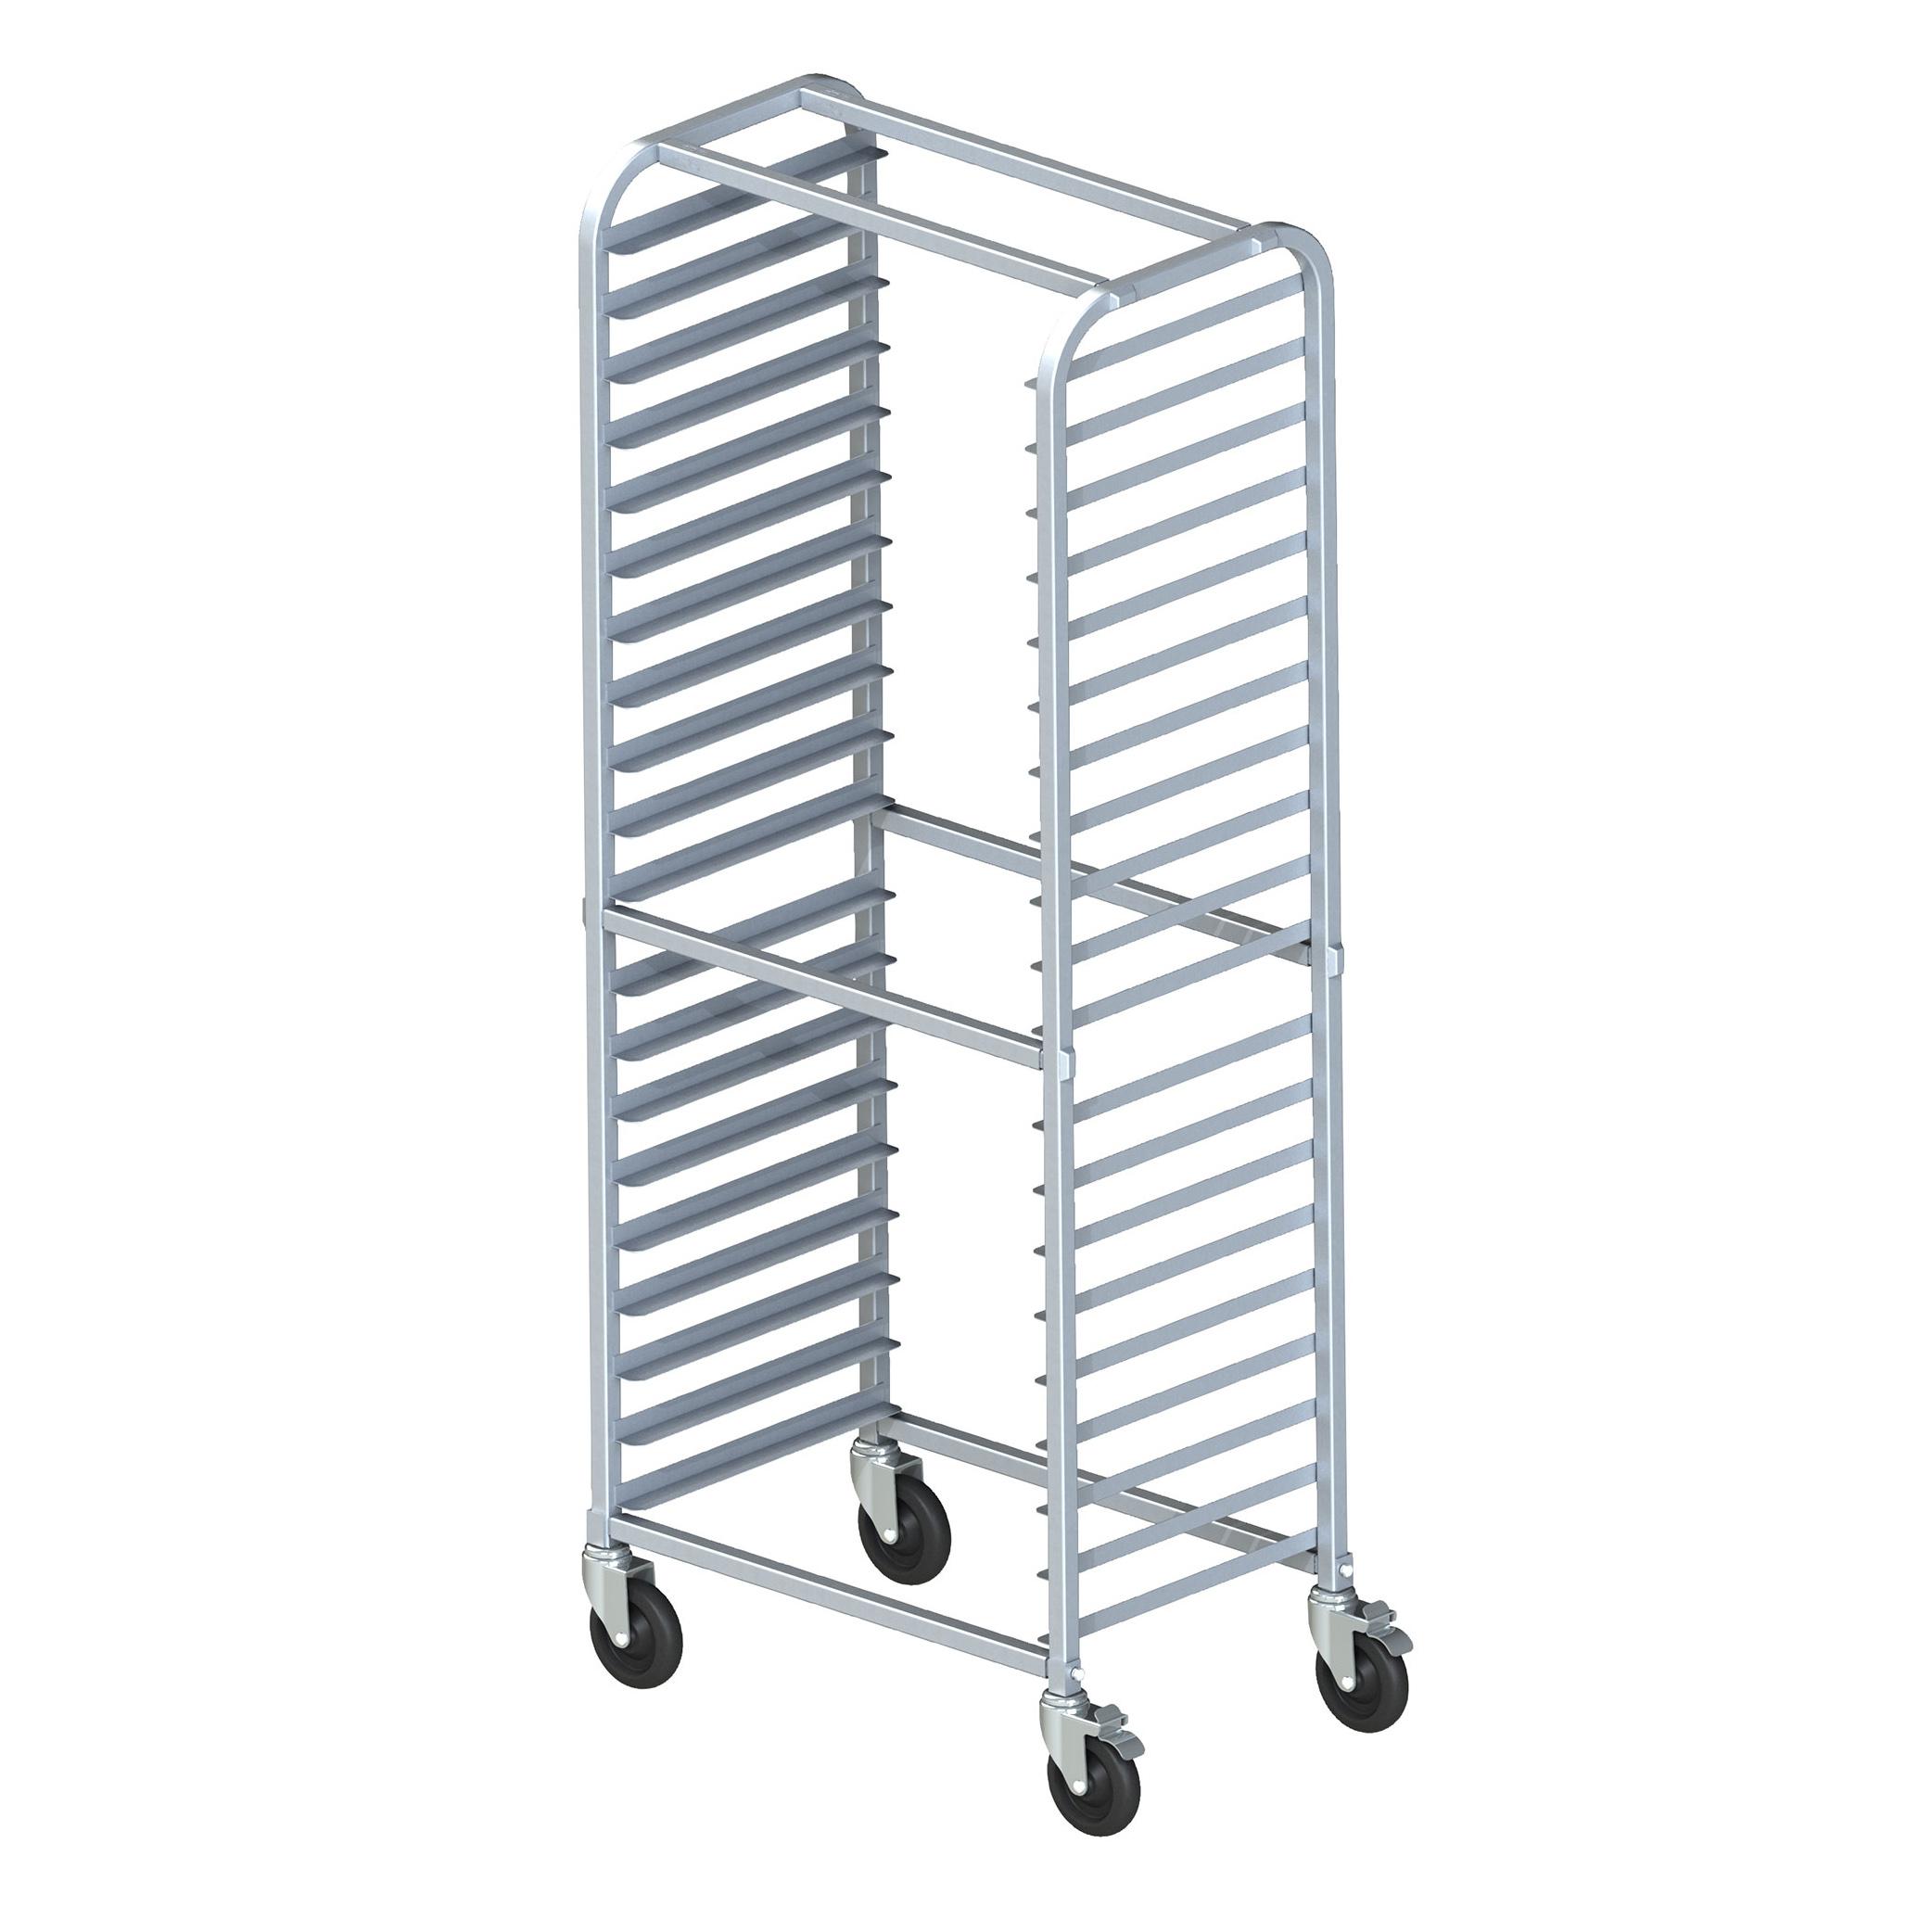 Winco AWRS-20BK pan rack, universal